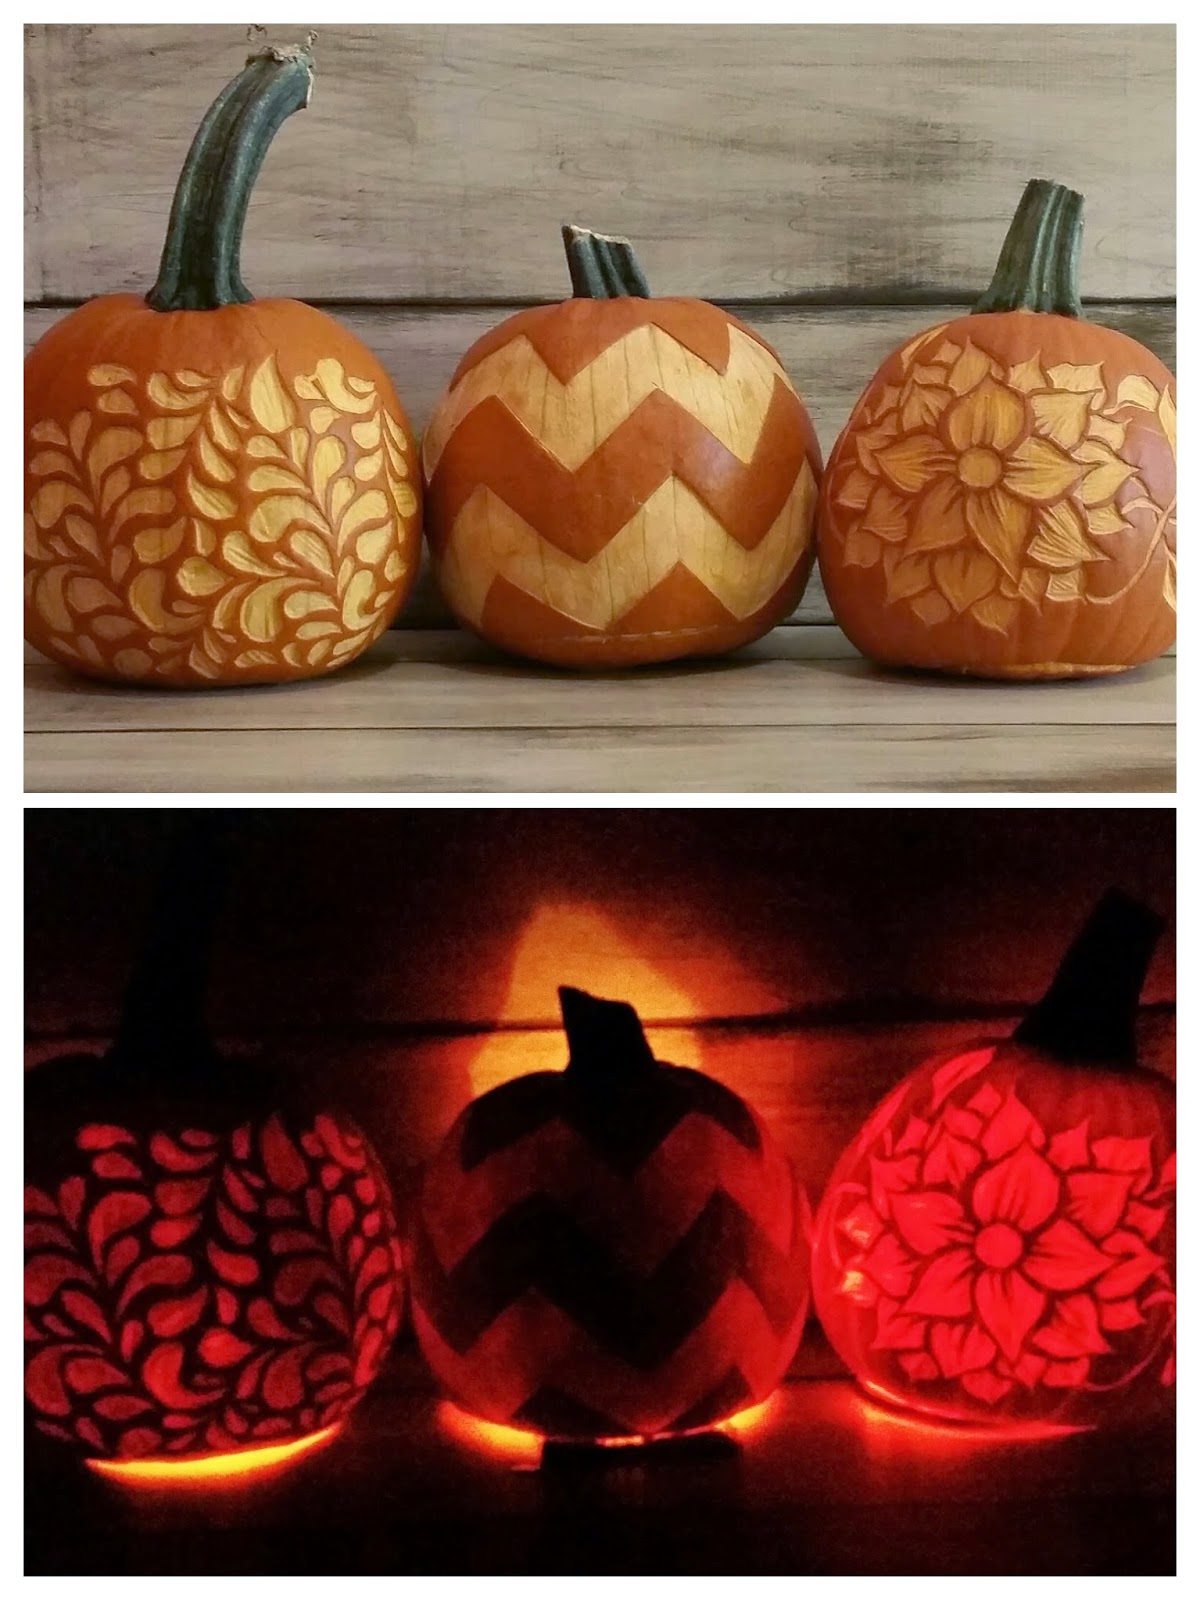 Diy vintage chic pumpkin carving